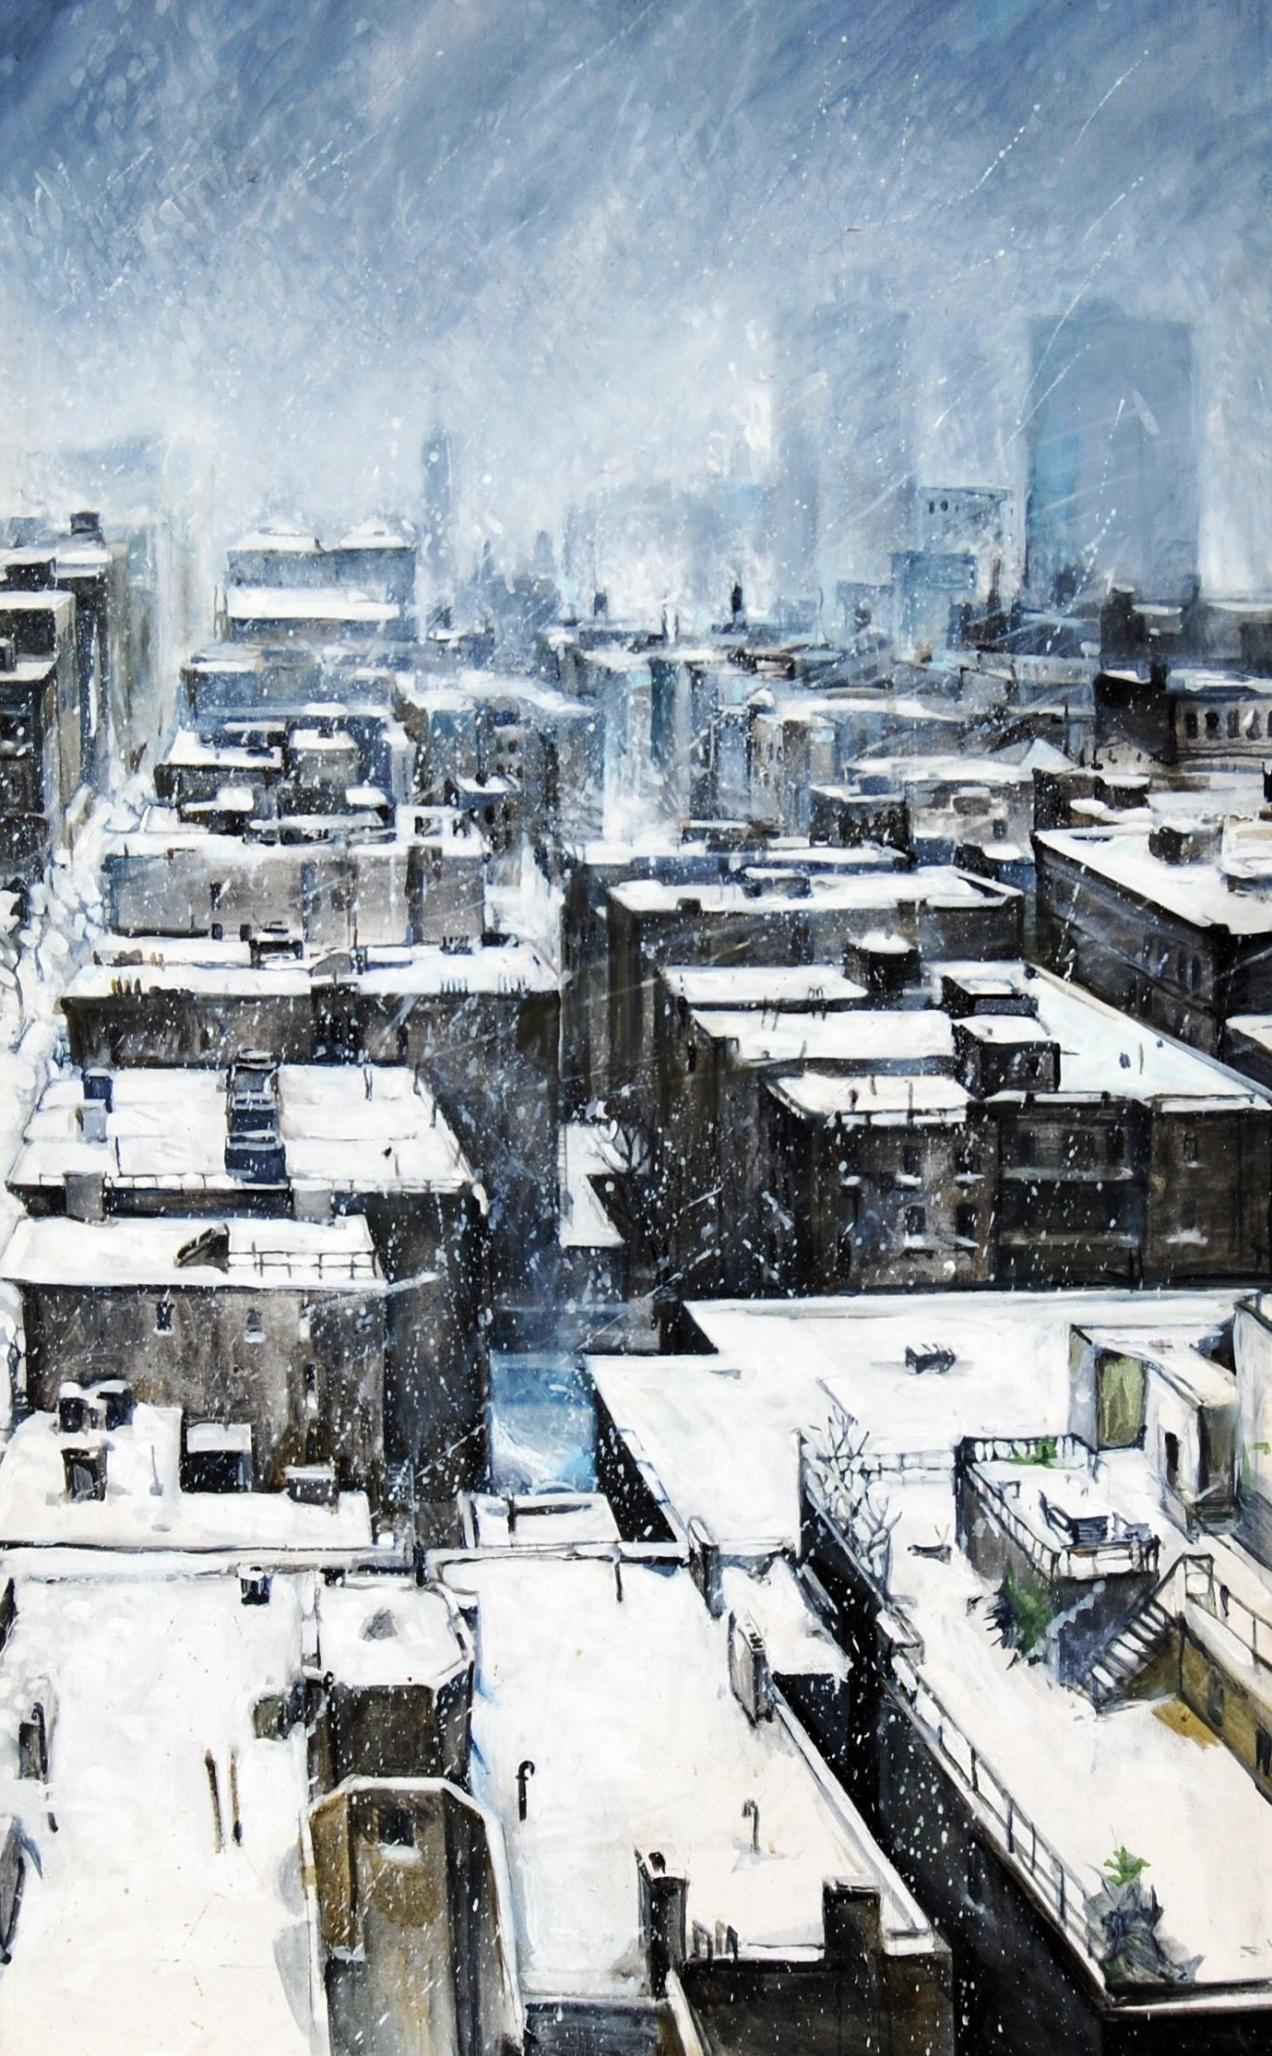 Blizzard of '96 (SoHo) 3' x  5' Oil on Canvas